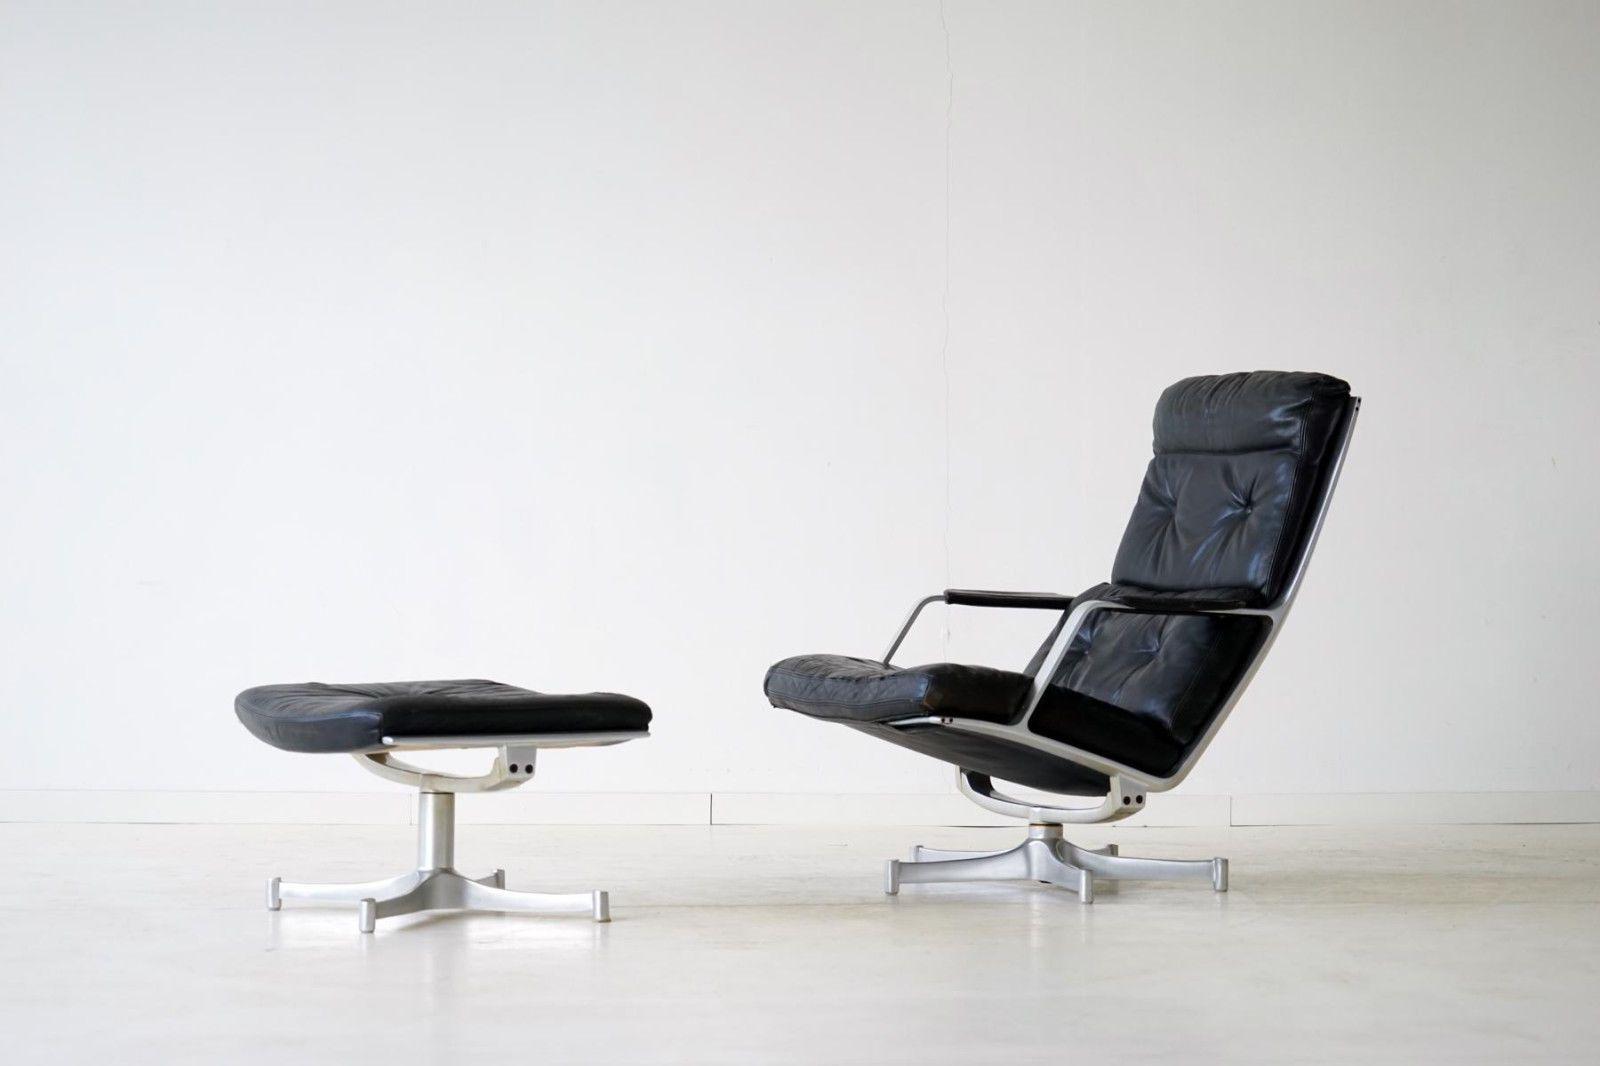 De Sede Leder Lounge Chair Relax Sessel Drehbar Hocker Ottomane Hocker Ottomane Lounge Chair Ottomane